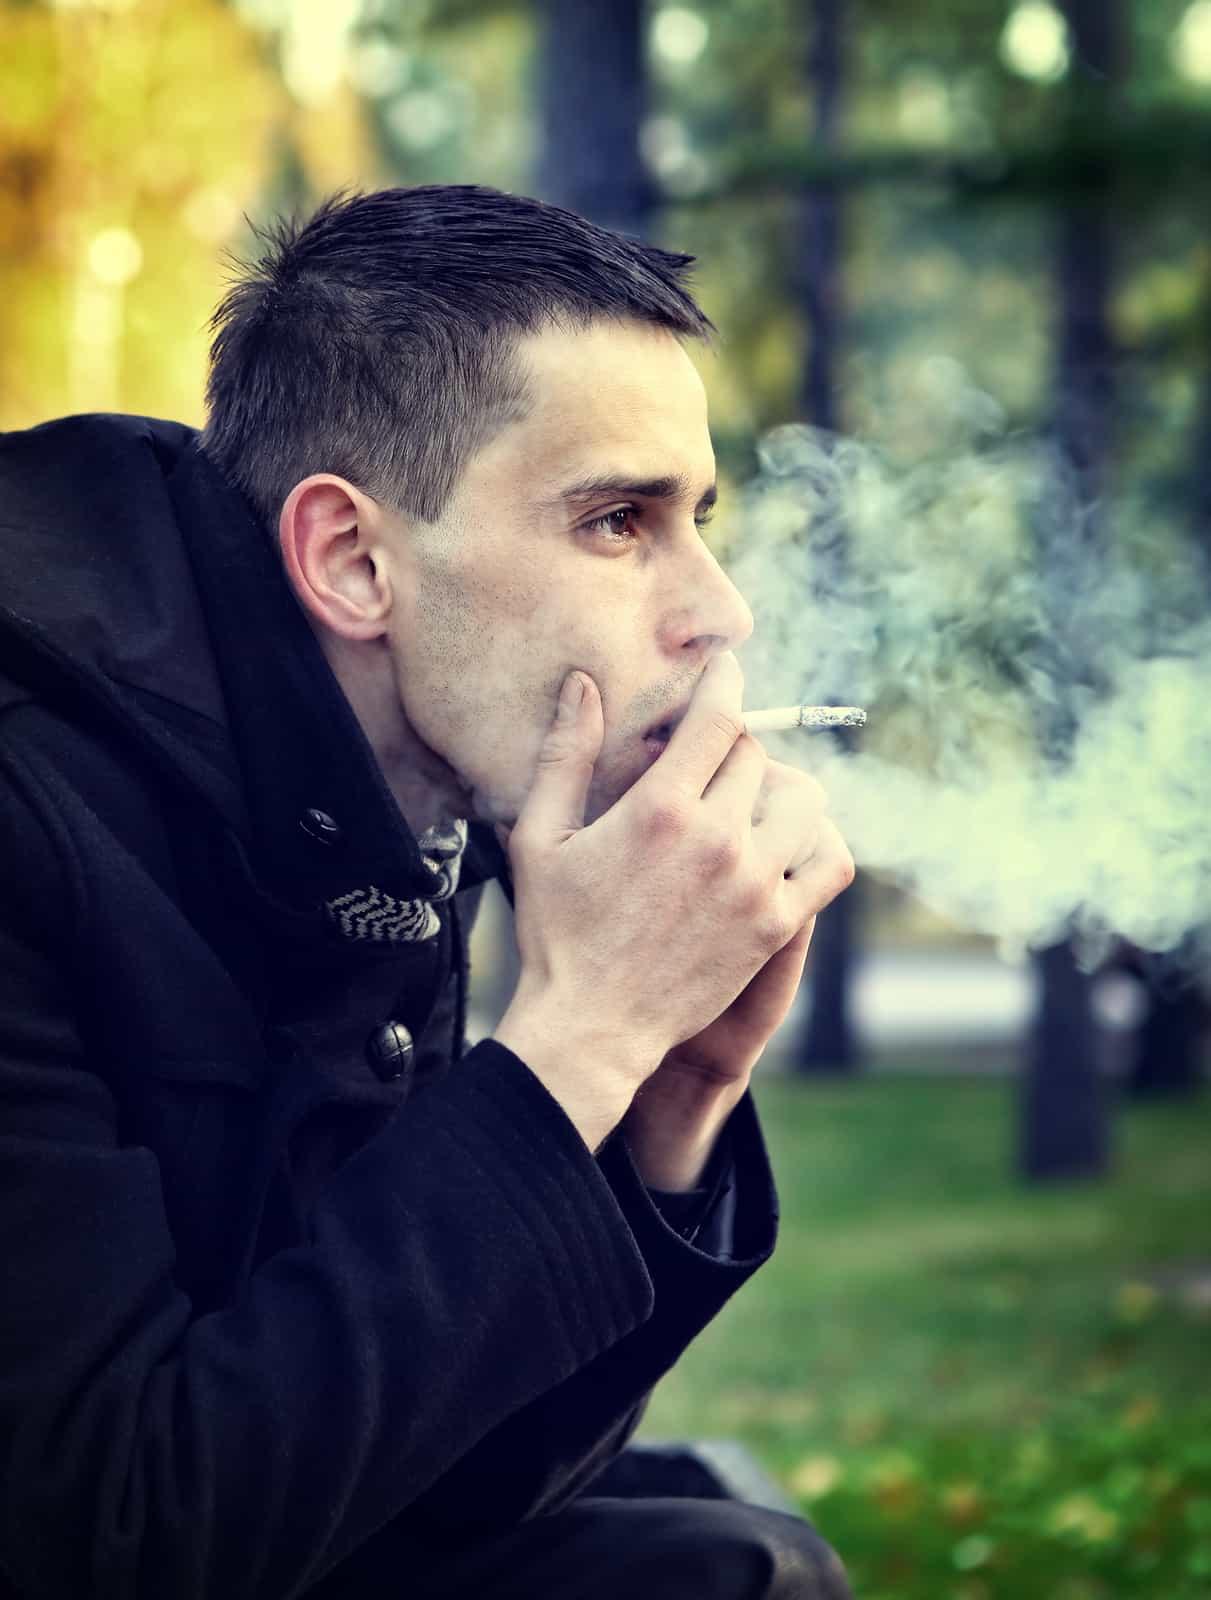 Sad Man With Cigarette